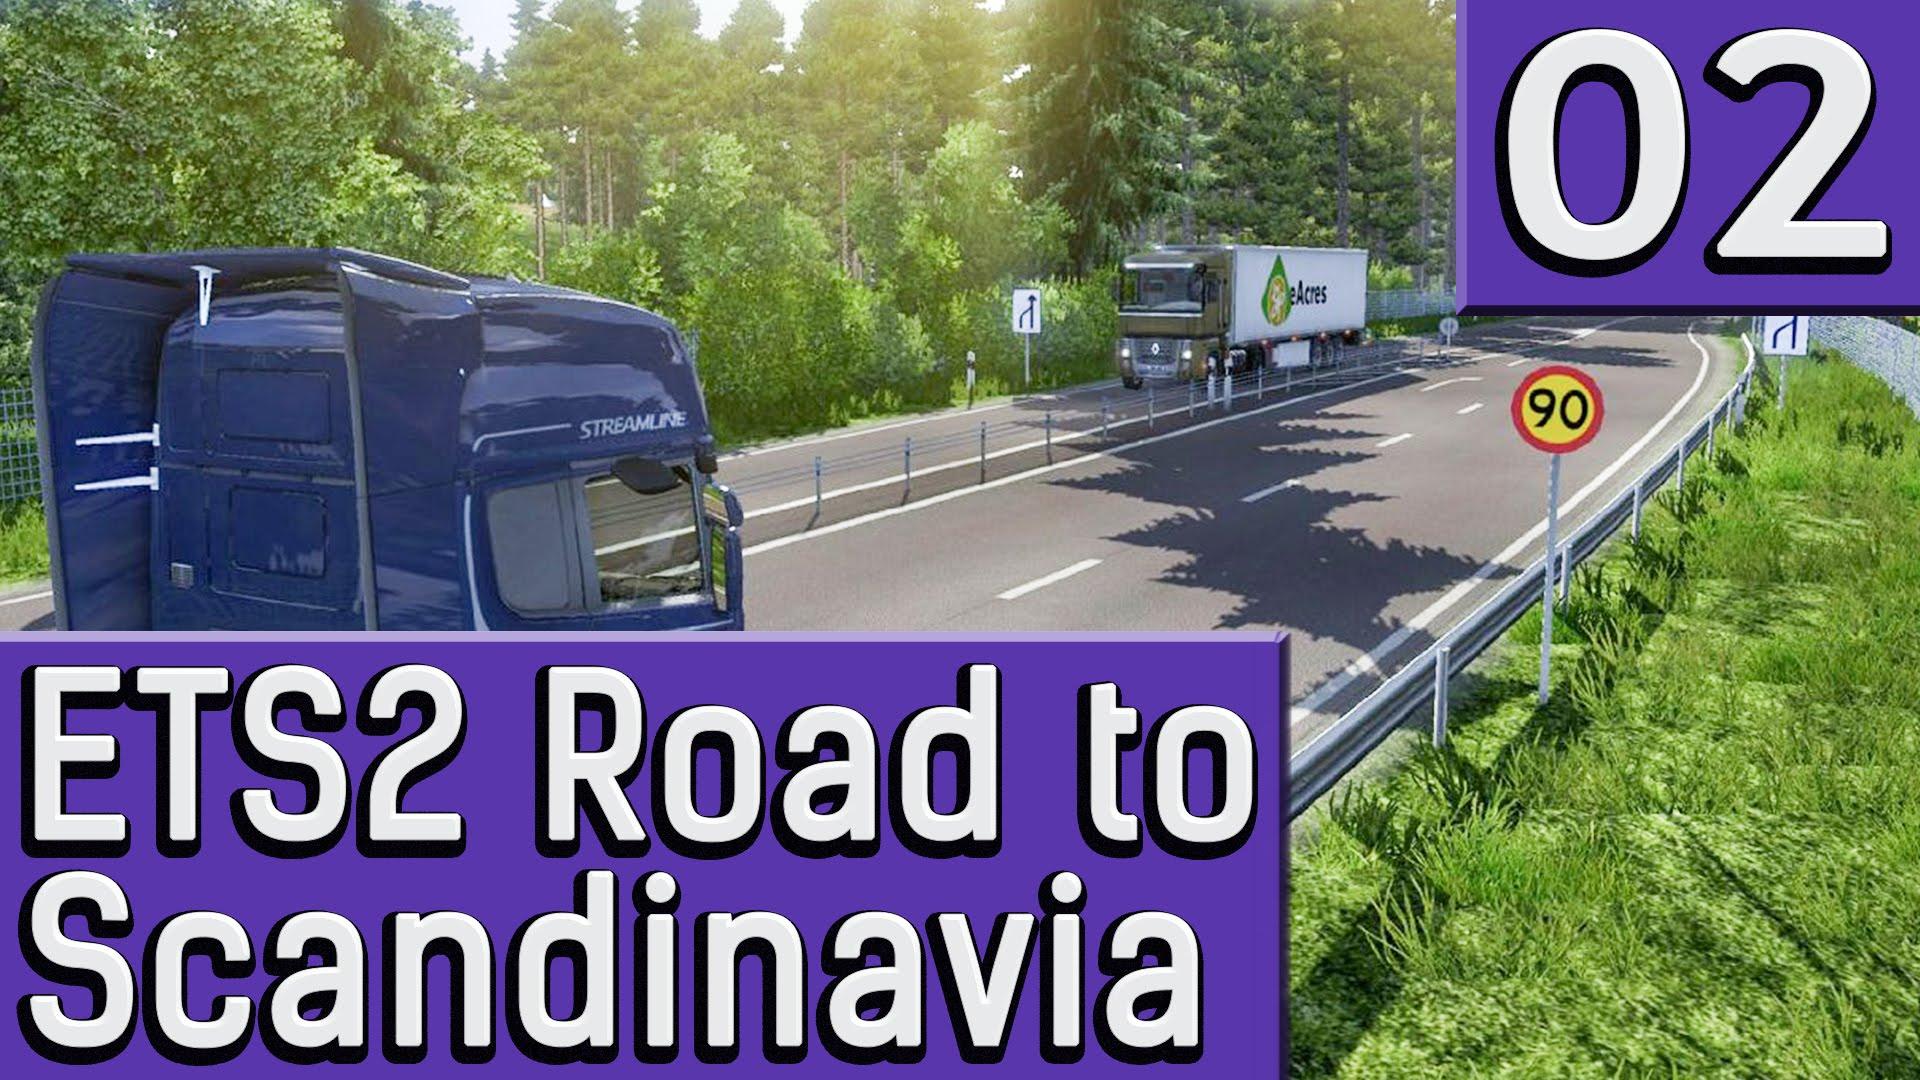 ETS2 Road to Scandinavia #2 Fast ganz ohne Unfall deutsch HD DLC Prweview